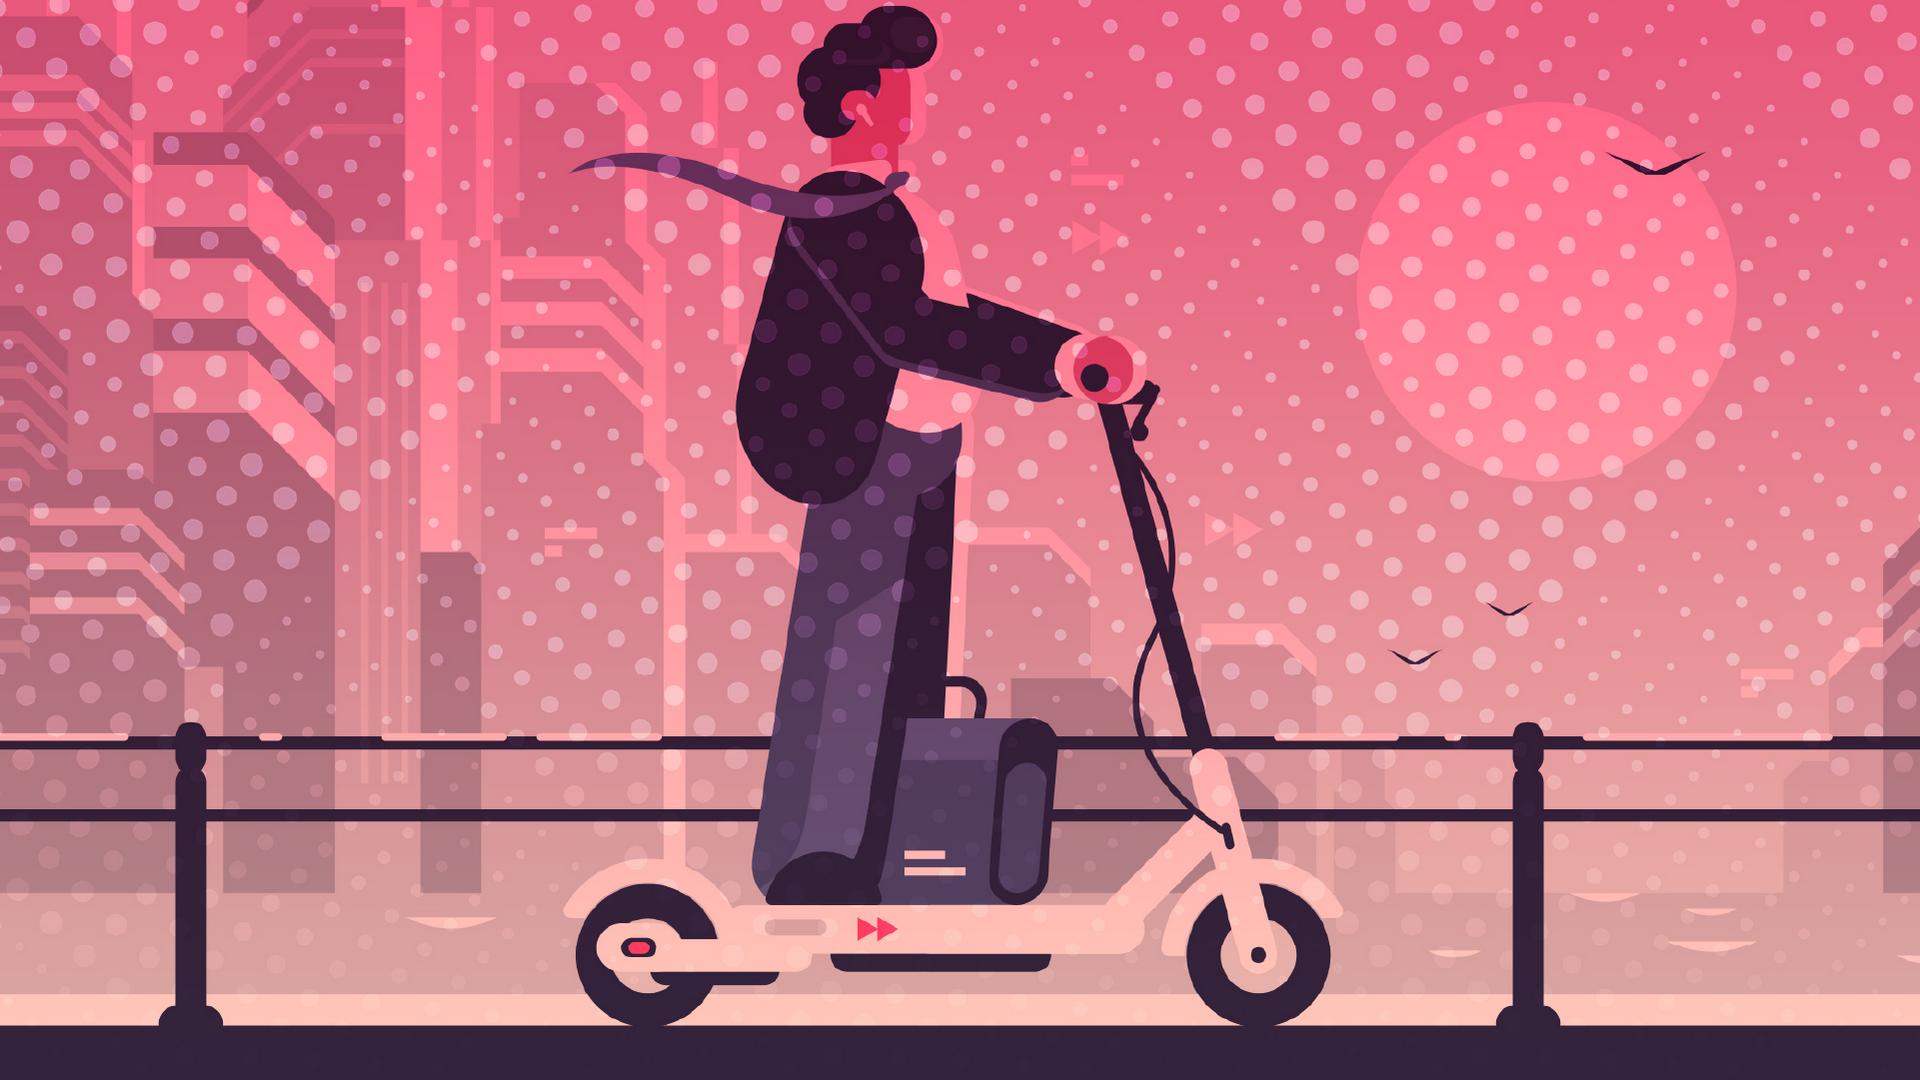 Elektromobilität, Straßenverkehr, E-Scooter, E-Roller, Roller, Elektrofahrzeug, Scooter, E-Mobilität, Elektroroller, Mobilität, Mobility, Personal Transport, tretroller, Elektroscooter, Elektro-Tretroller